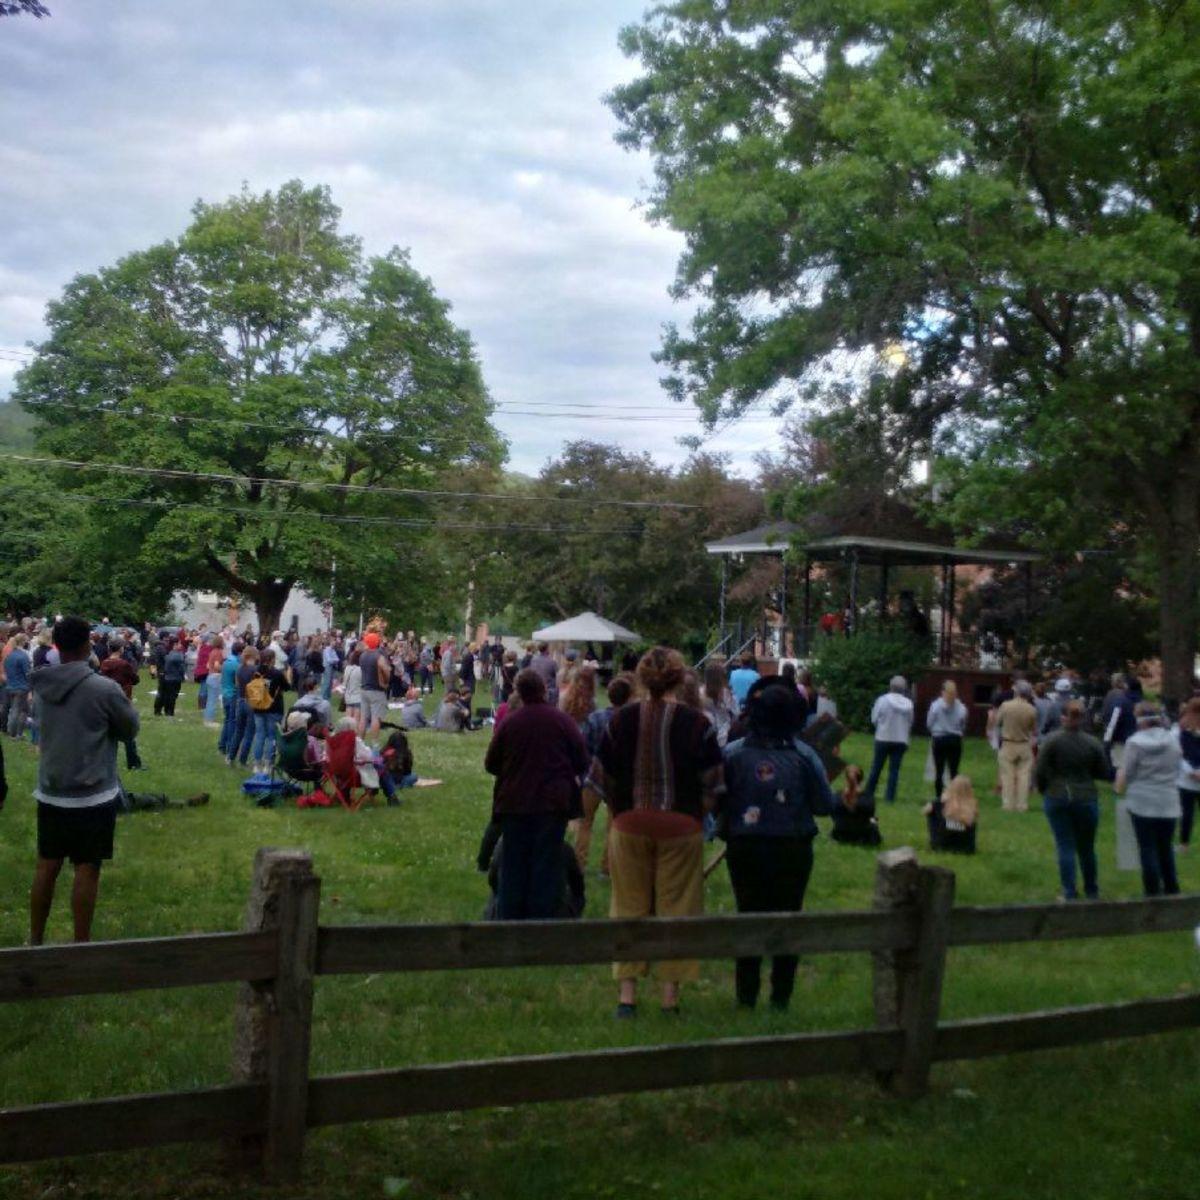 Windsor, Black Lives Matter Rally